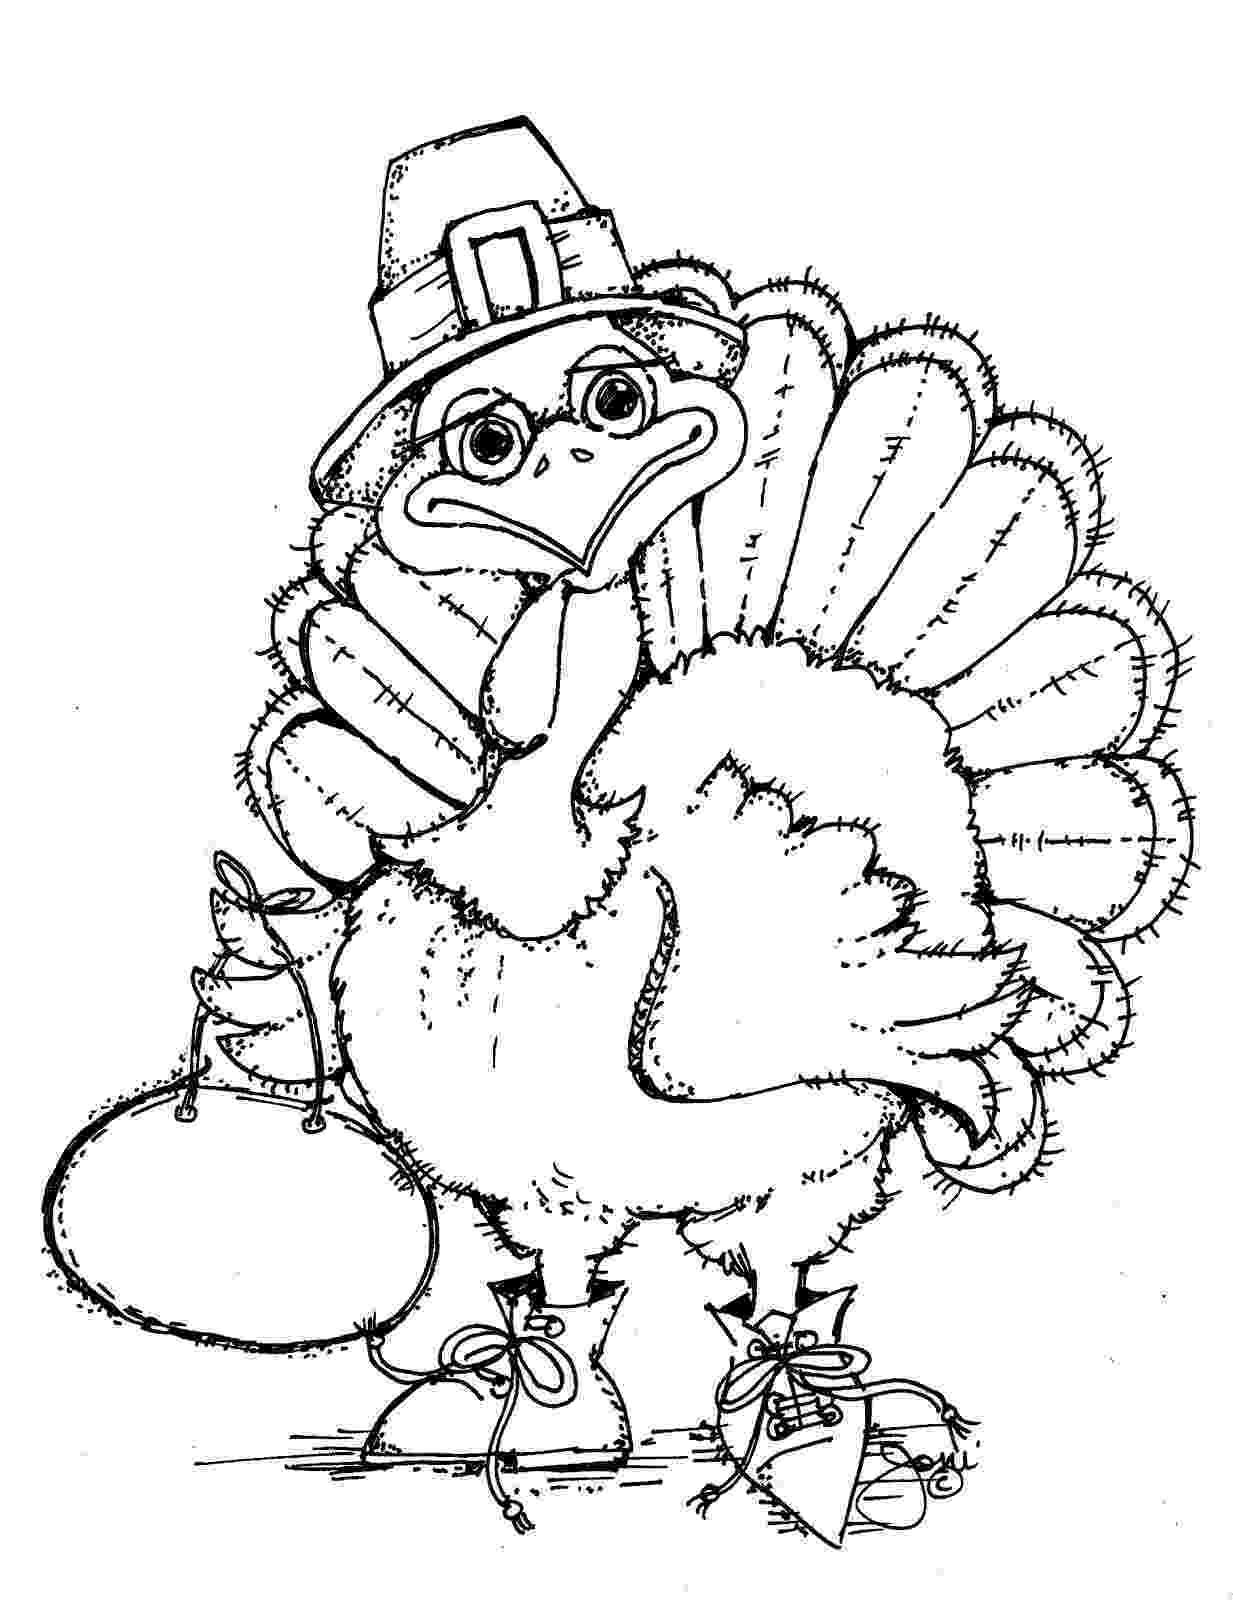 turkey coloring sheet free printable turkey coloring pages for kids sheet coloring turkey